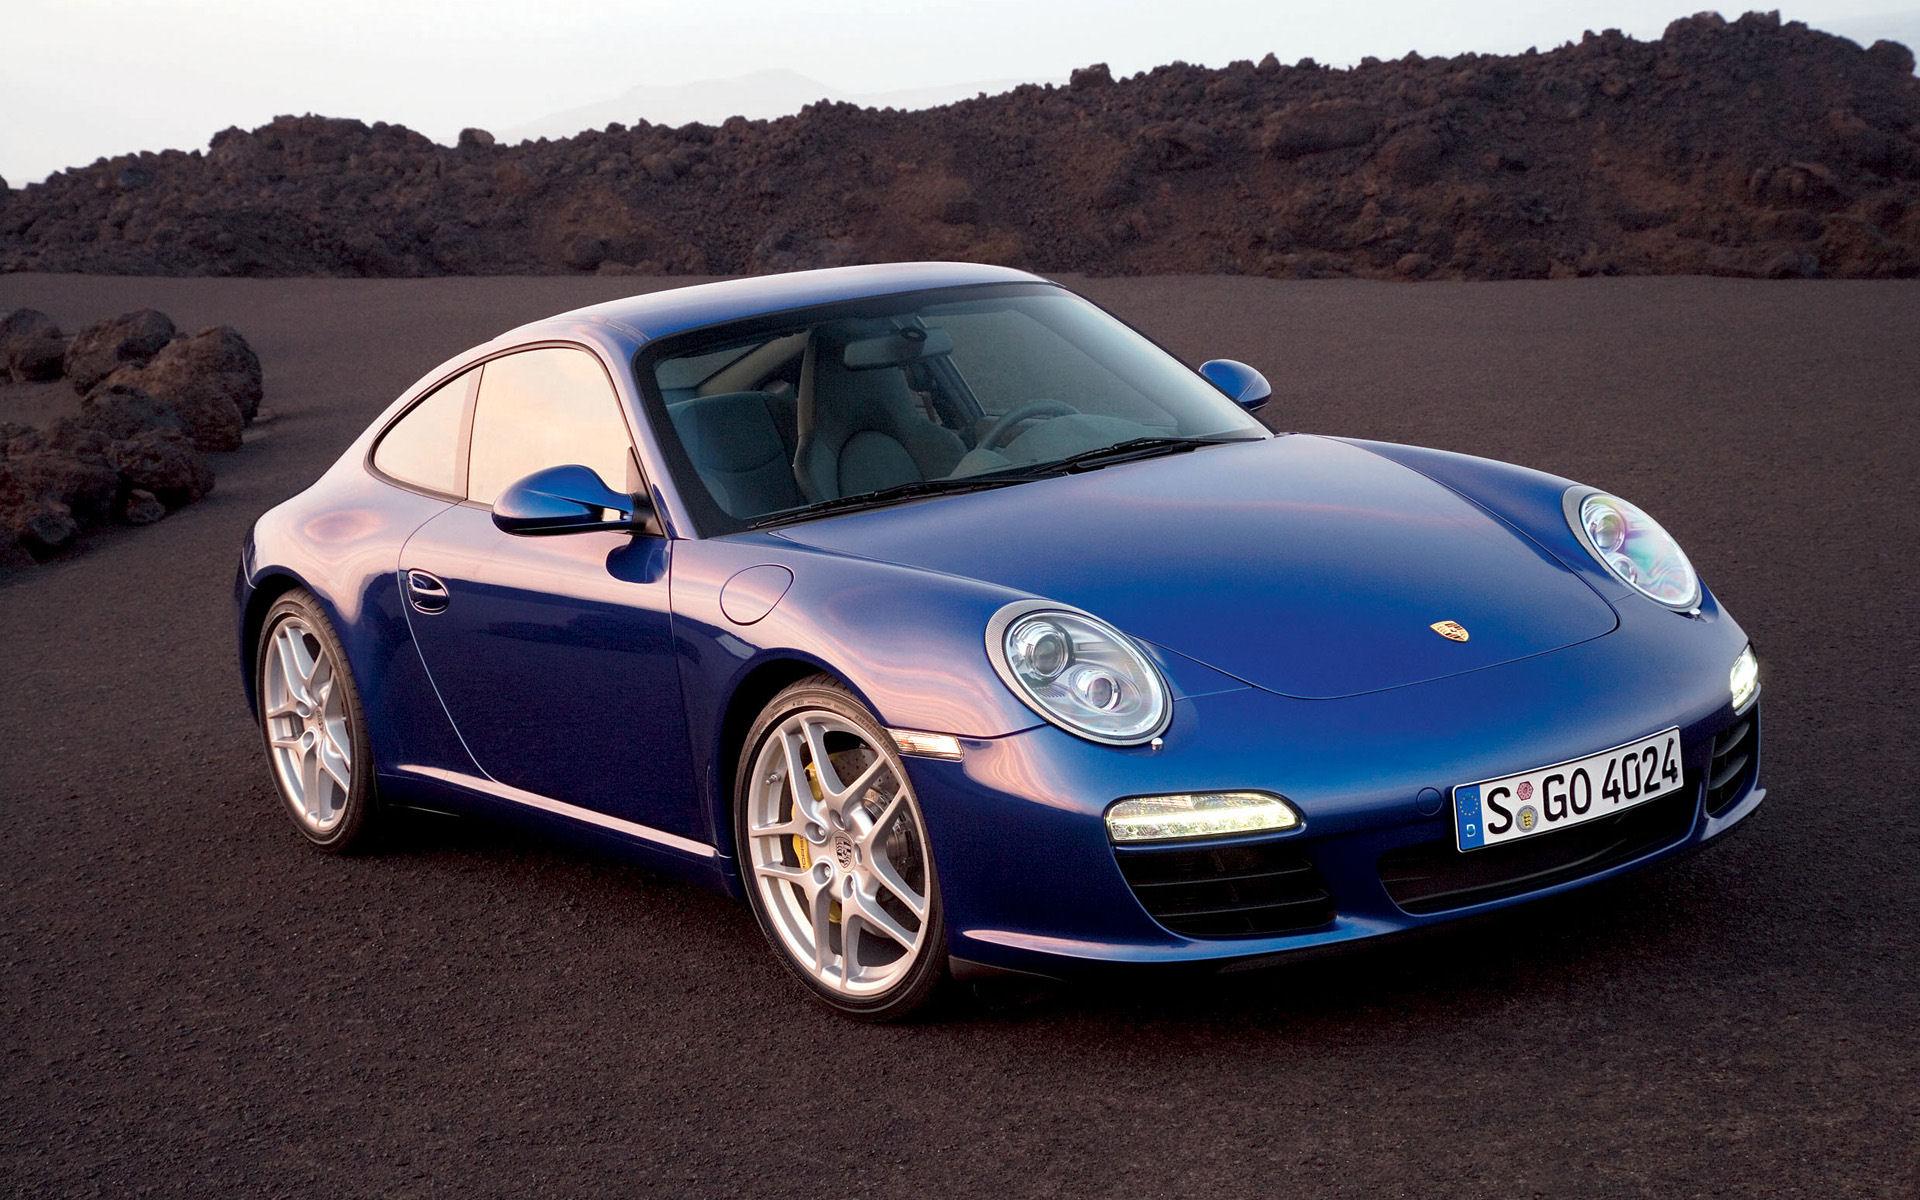 2008 Porsche 911 Carrera S wallpaper   411611 1920x1200